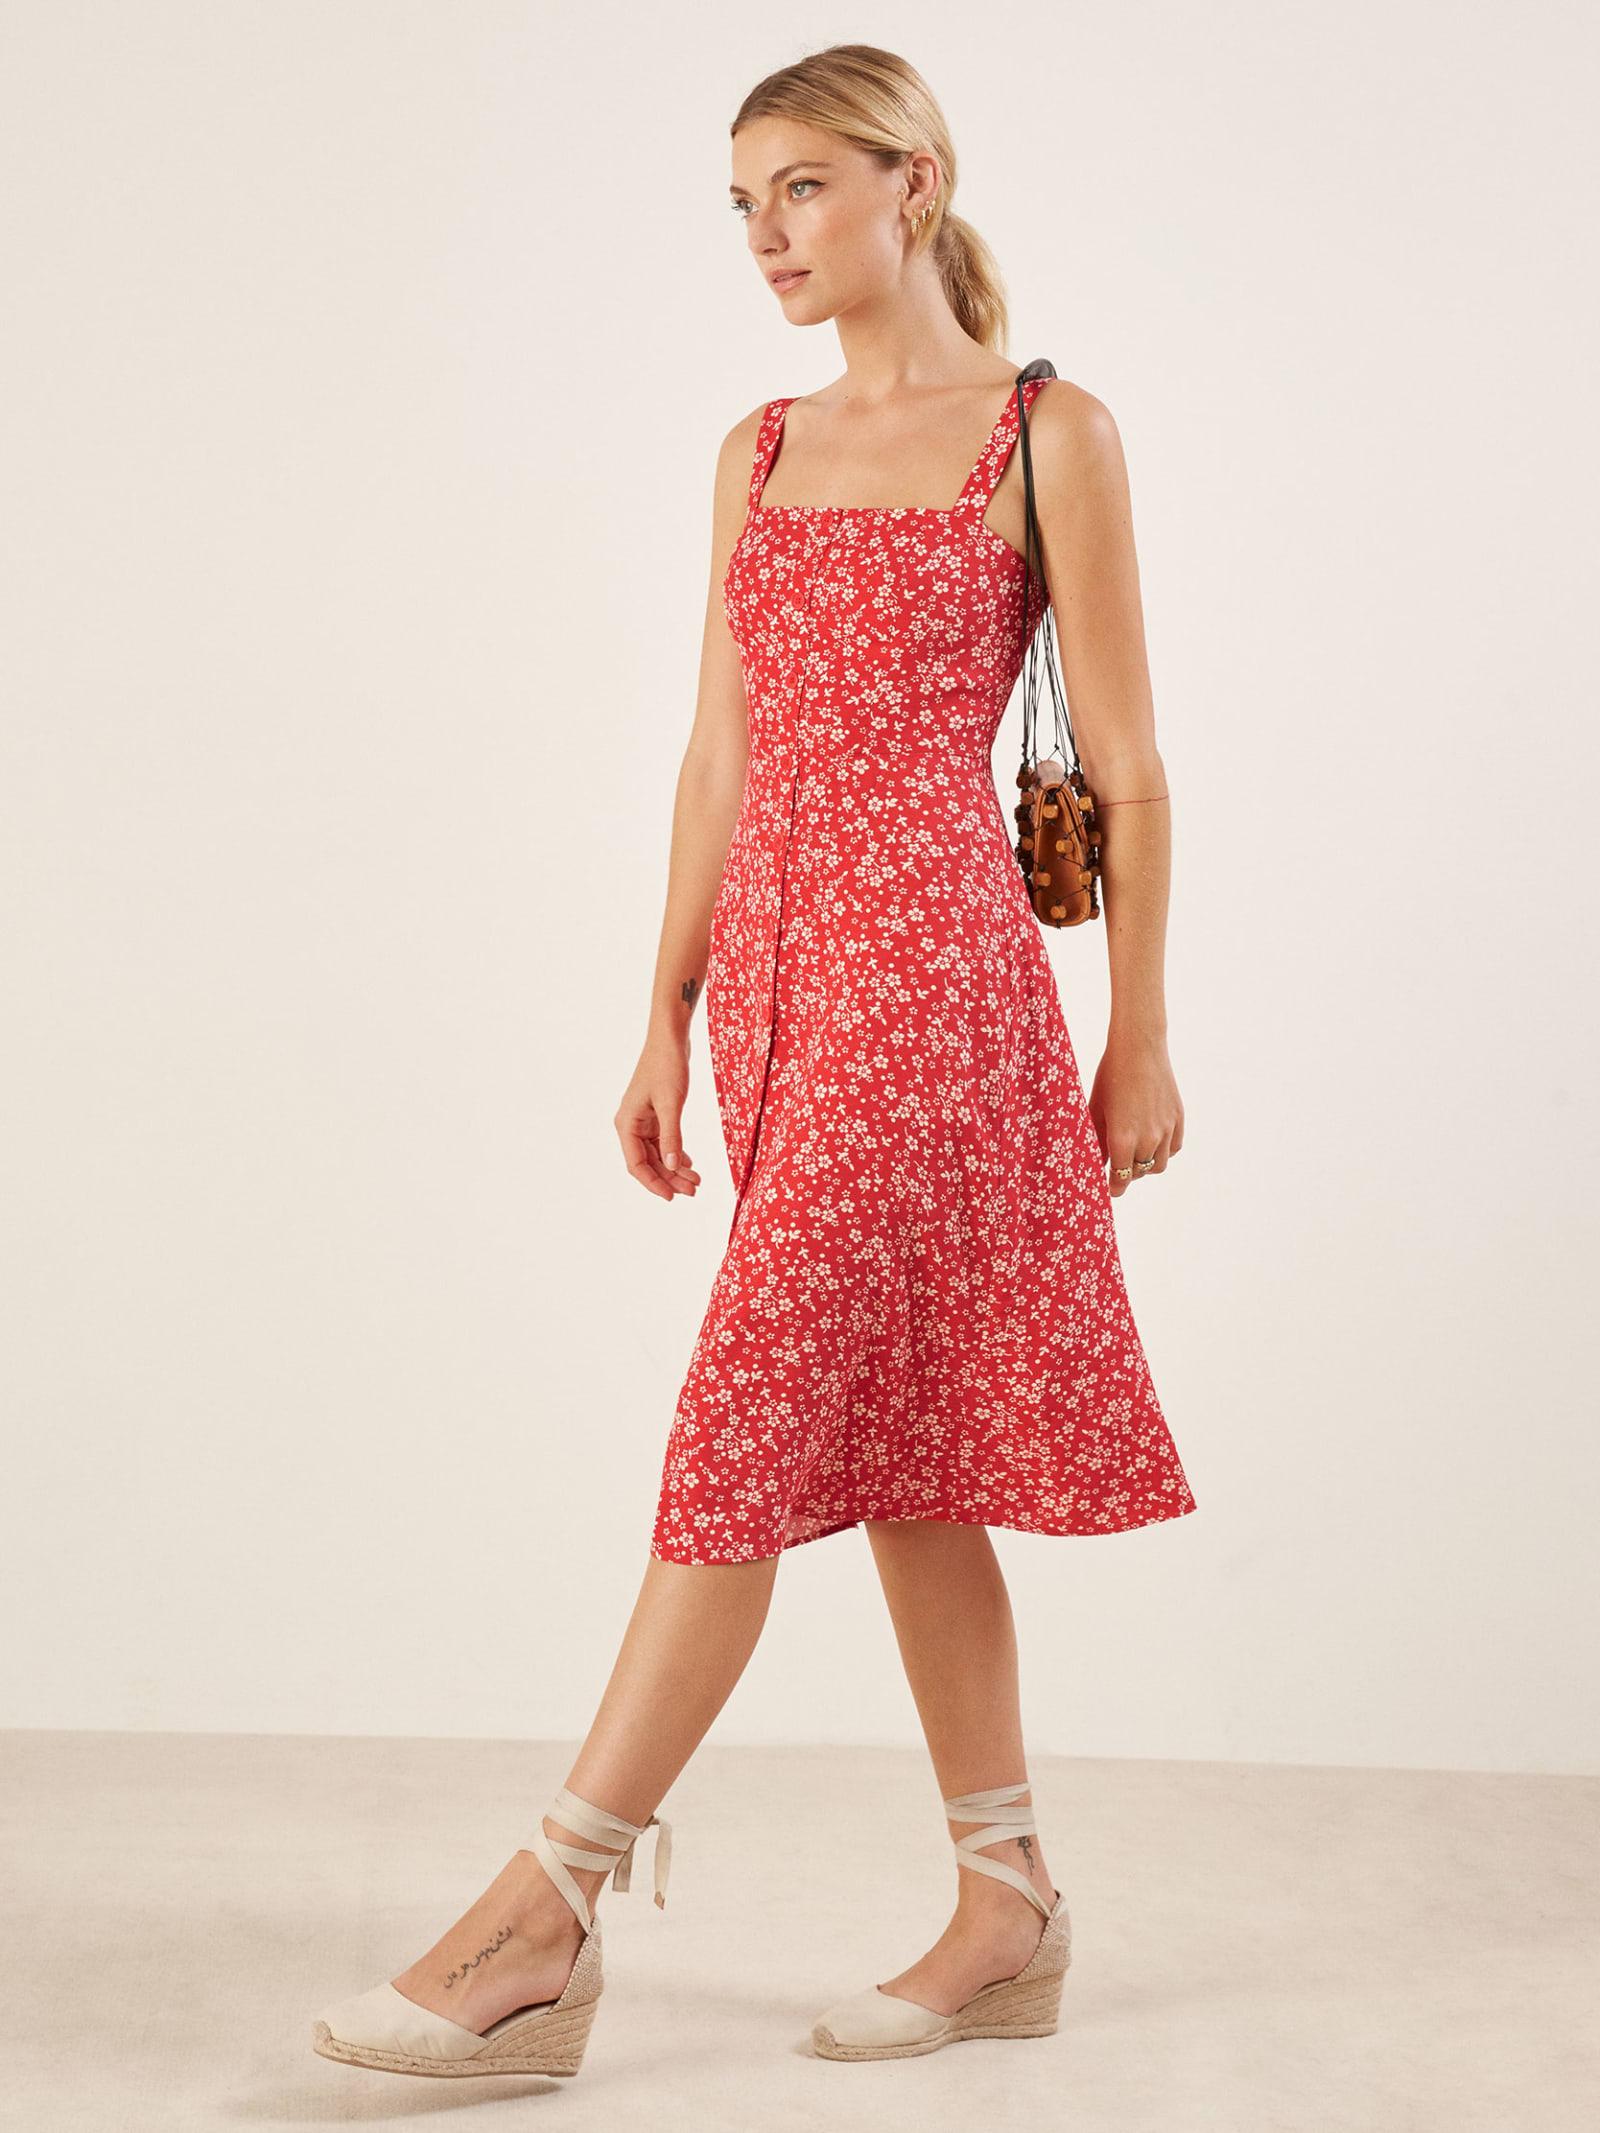 429b747c2c4 Petites Persimmon Dress - Reformation